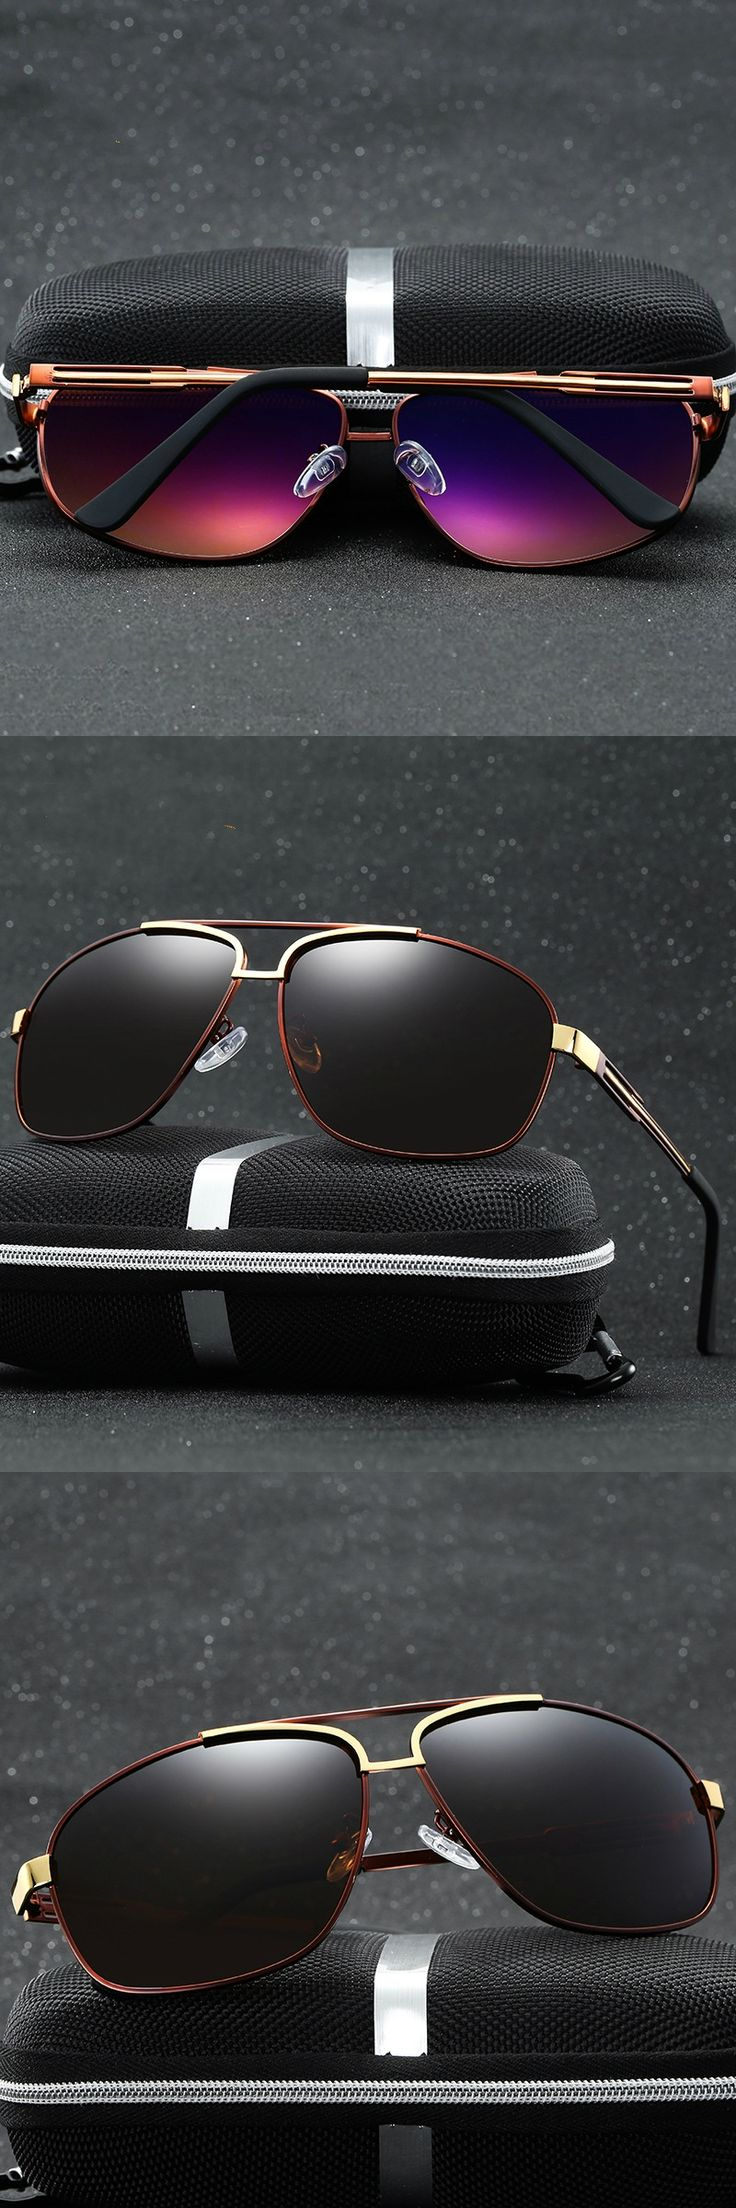 2017 Metal Frame Vintage Polarized aviator Sunglasses Men Brand Design Driving Fishing Travel Fashion lunettes de soleil homme